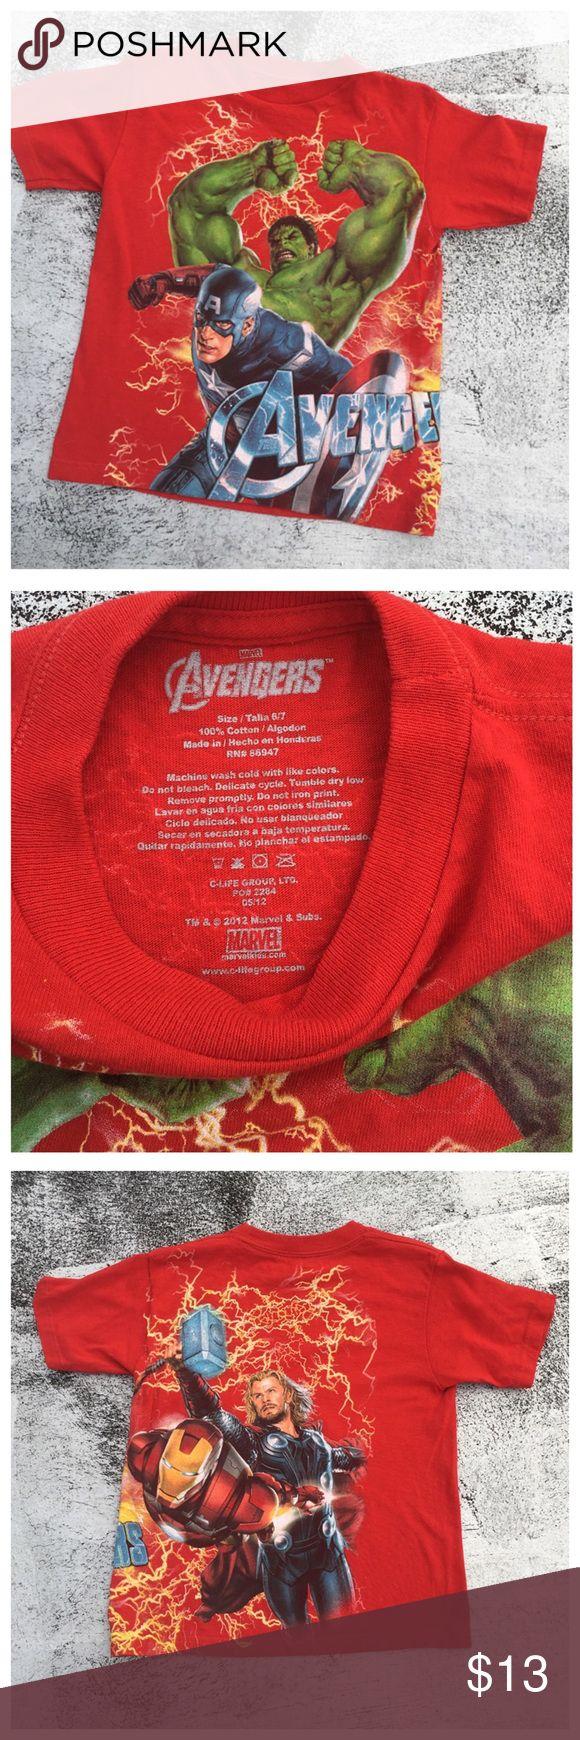 🆕 Avengers T-shirt Boys 6/7 or XSmall on a petite woman Shirts & Tops Tees - Short Sleeve